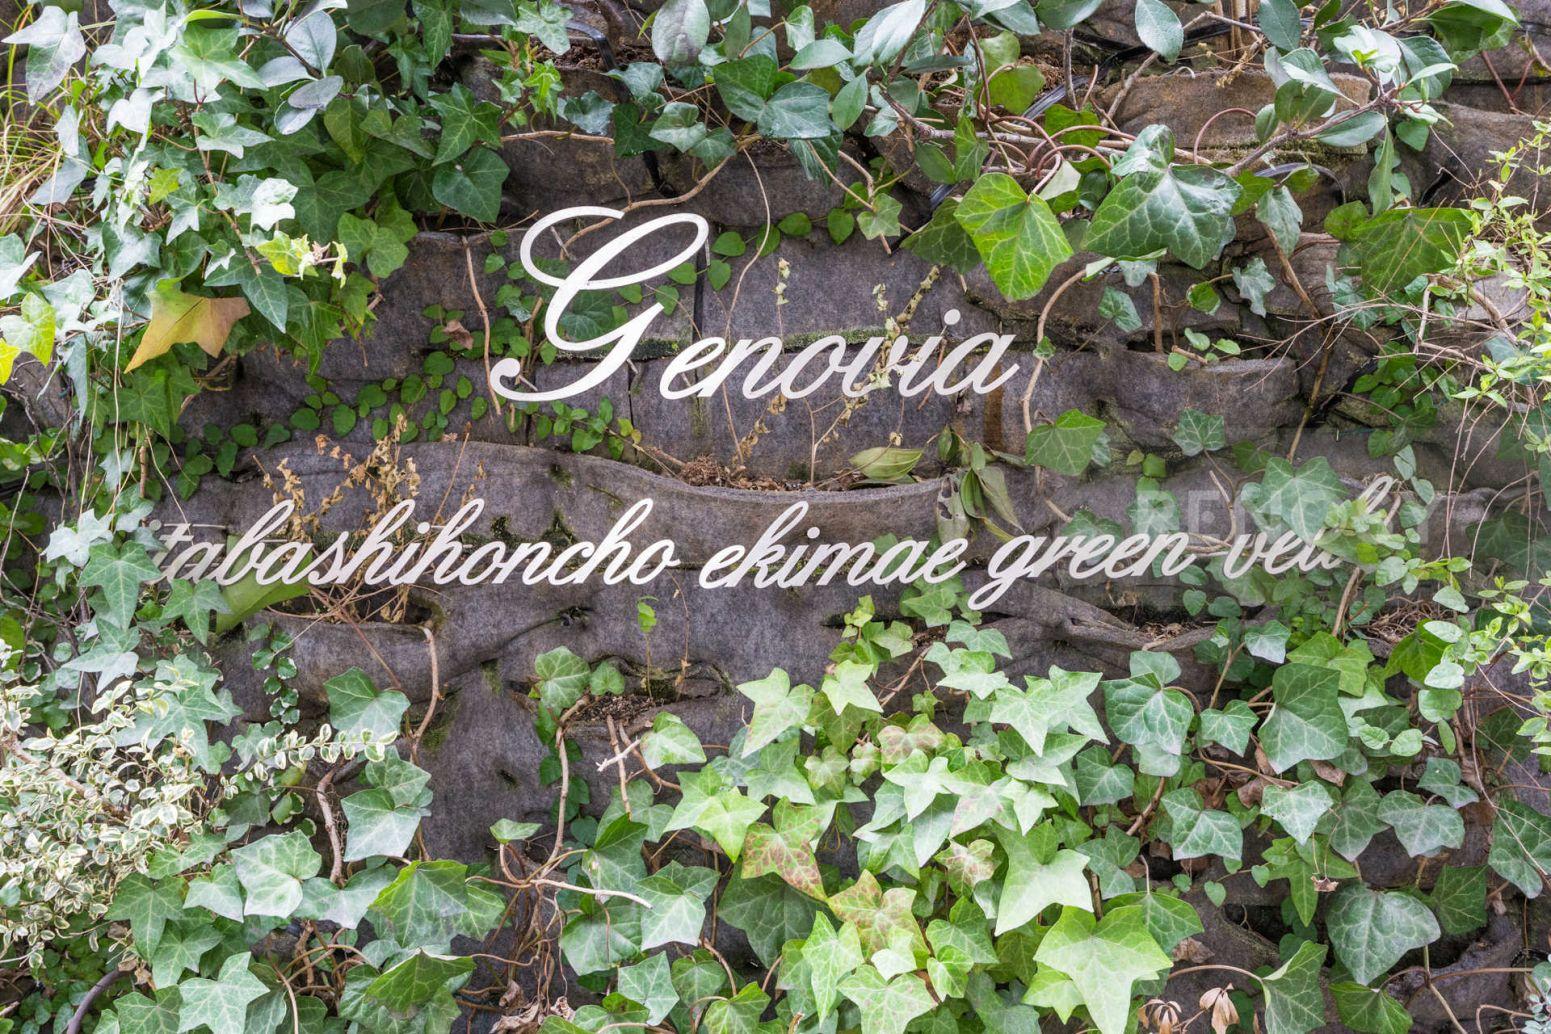 GENOVIA板橋本町駅前green veil